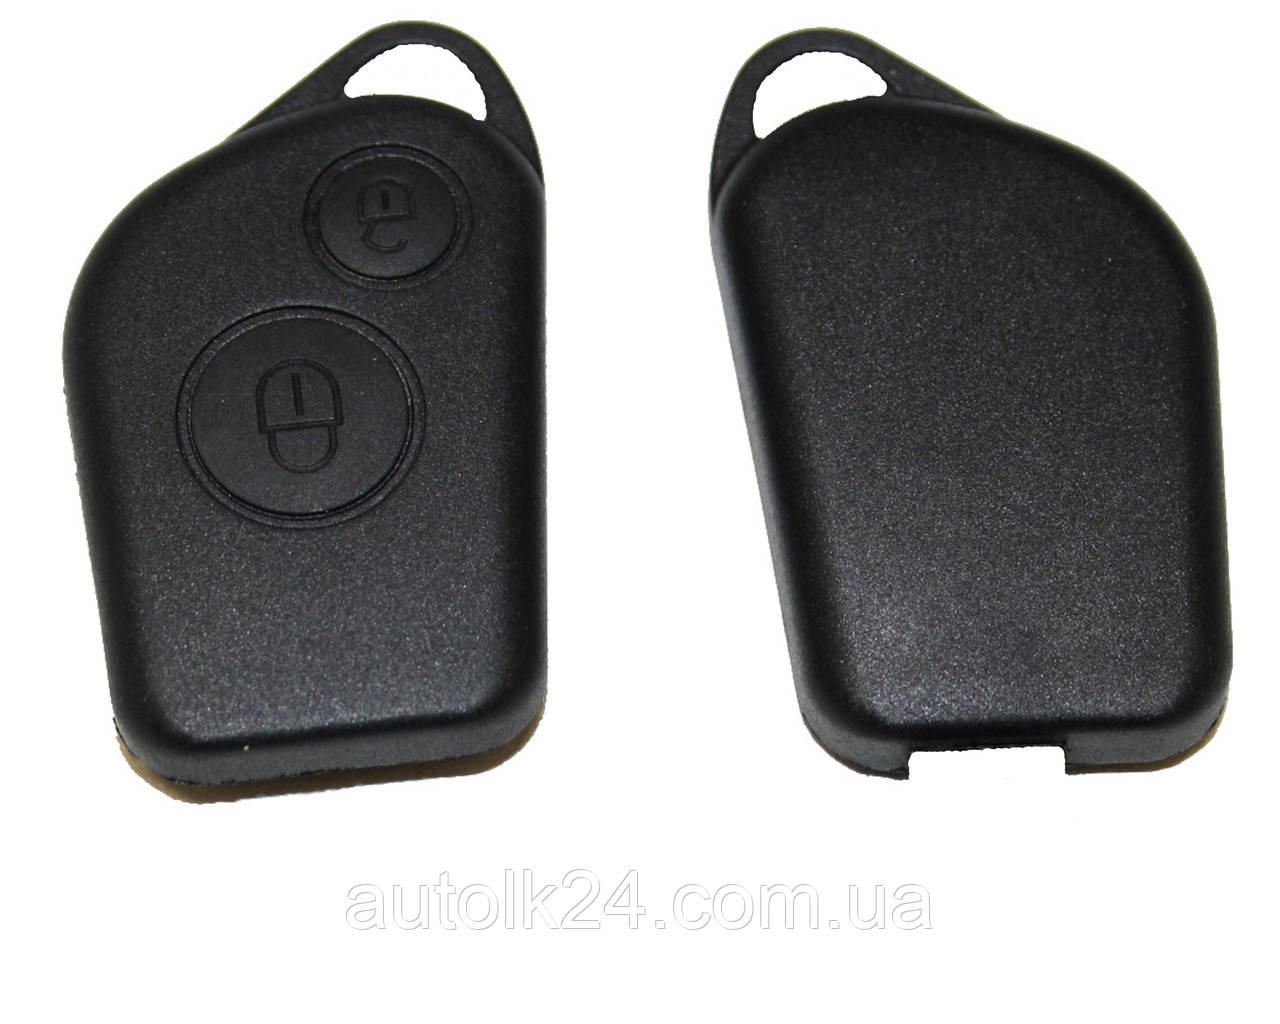 Корпус ключа для Citroen 2 кнопки